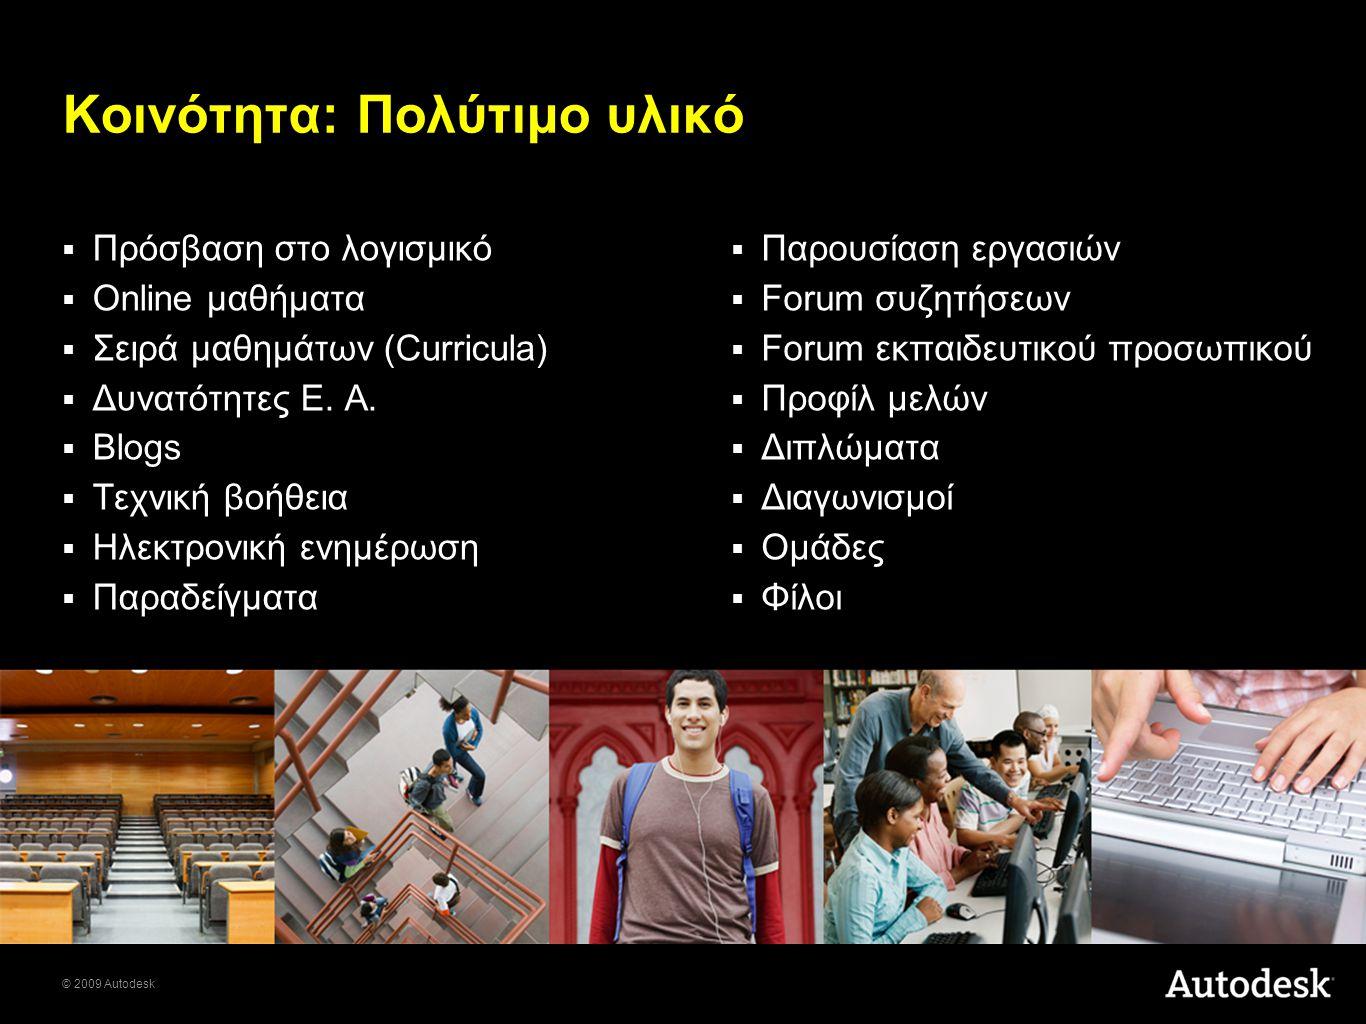 © 2009 Autodesk Κοινότητα: Πολύτιμο υλικό  Πρόσβαση στο λογισμικό  Online μαθήματα  Σειρά μαθημάτων (Curricula)  Δυνατότητες Ε. Α.  Blogs  Τεχνι